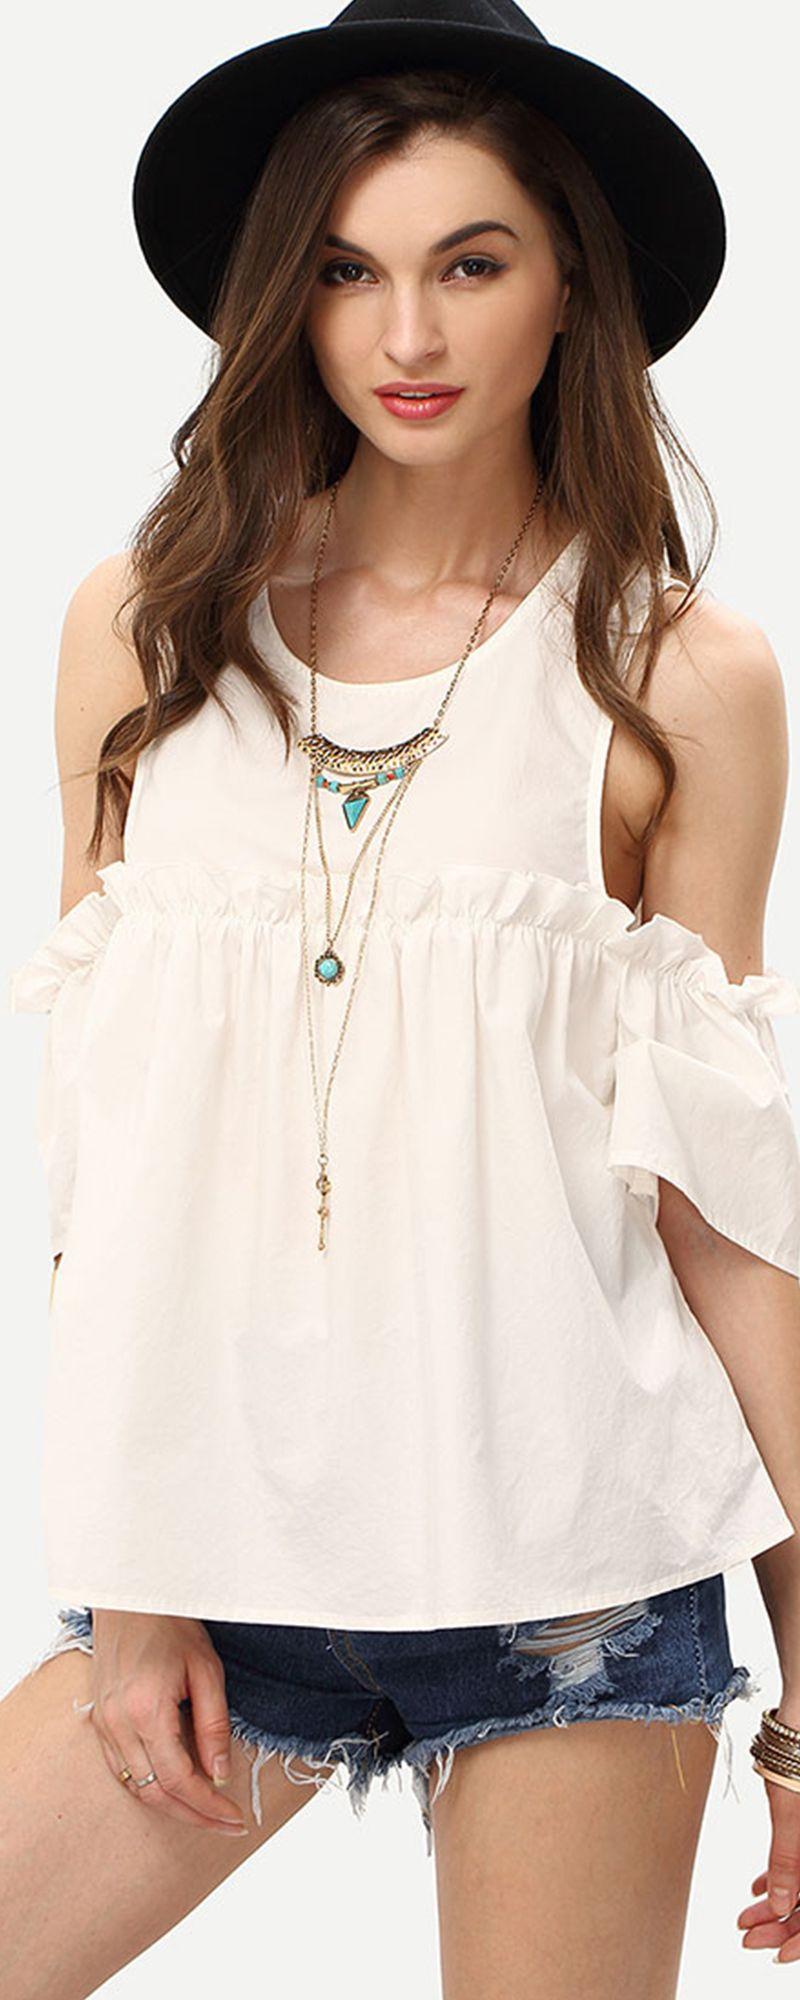 White Cold Shoulder Ruffle Details Blouse - Cute Tops - Romwe.com